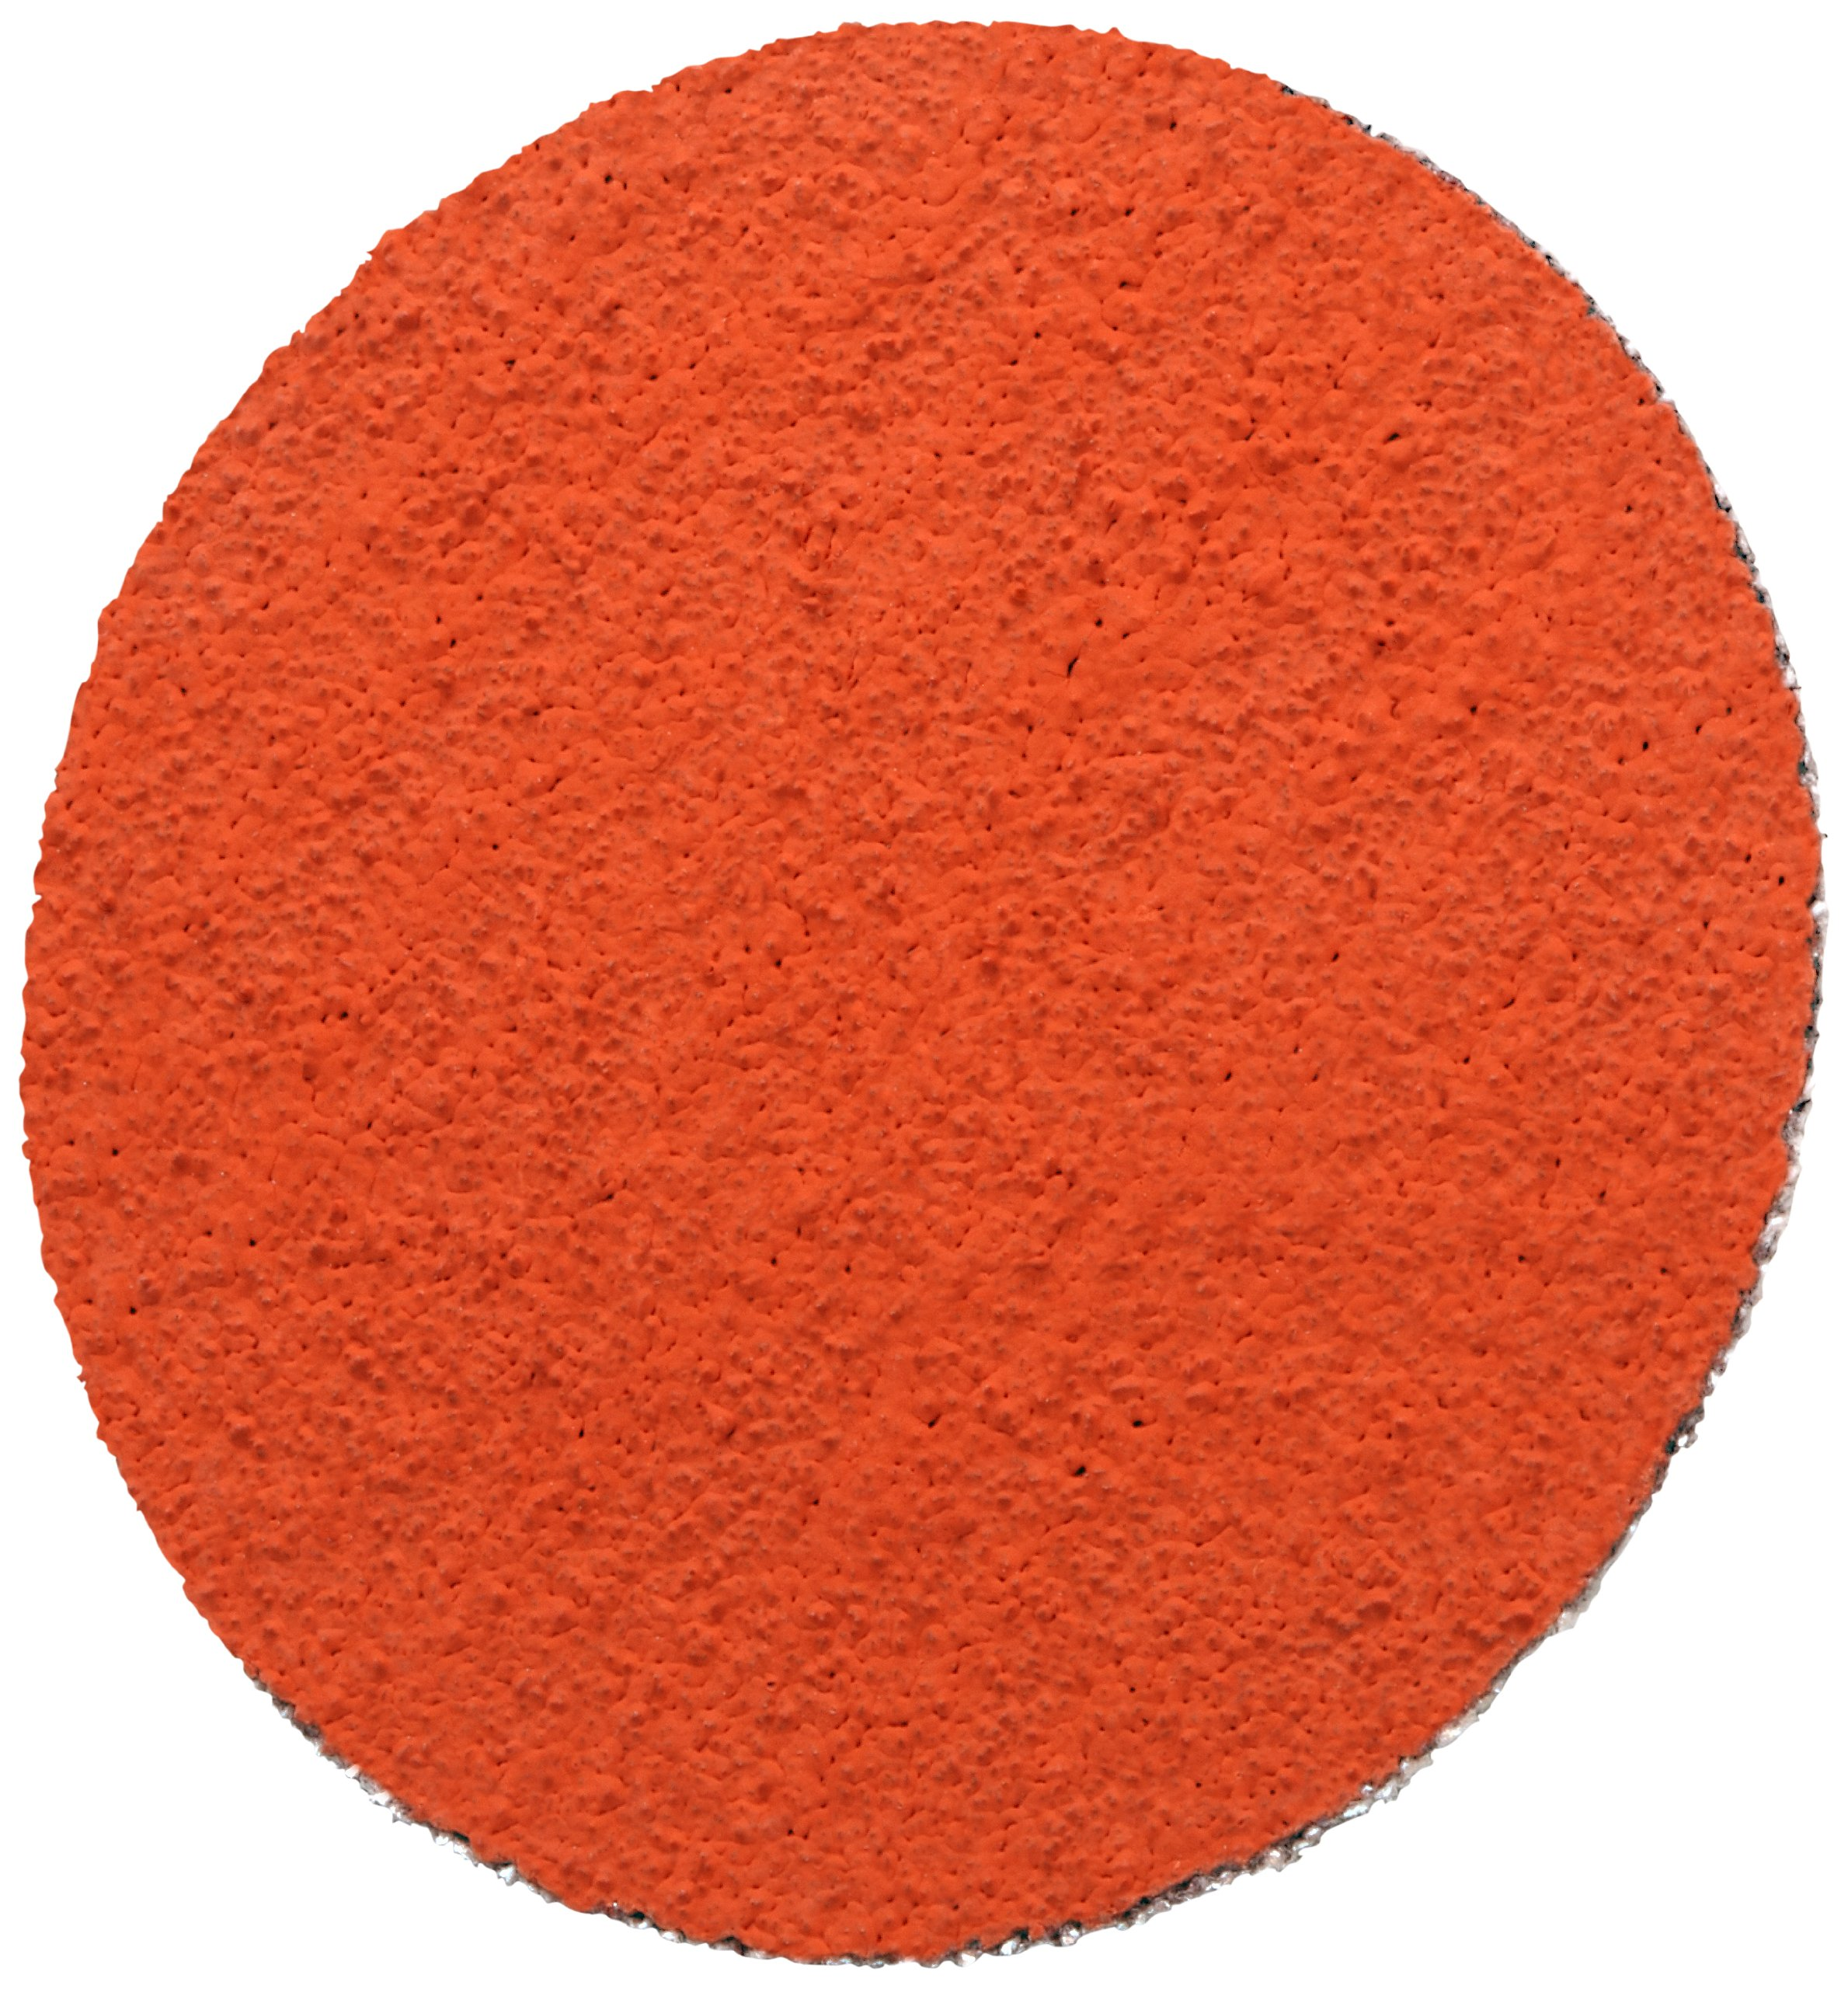 3M Roloc Disc 777F, Cloth, TR Attachment, Ceramic Aluminum Oxide, 2'' Diameter, 36 Grit (Pack of 50) by Cubitron